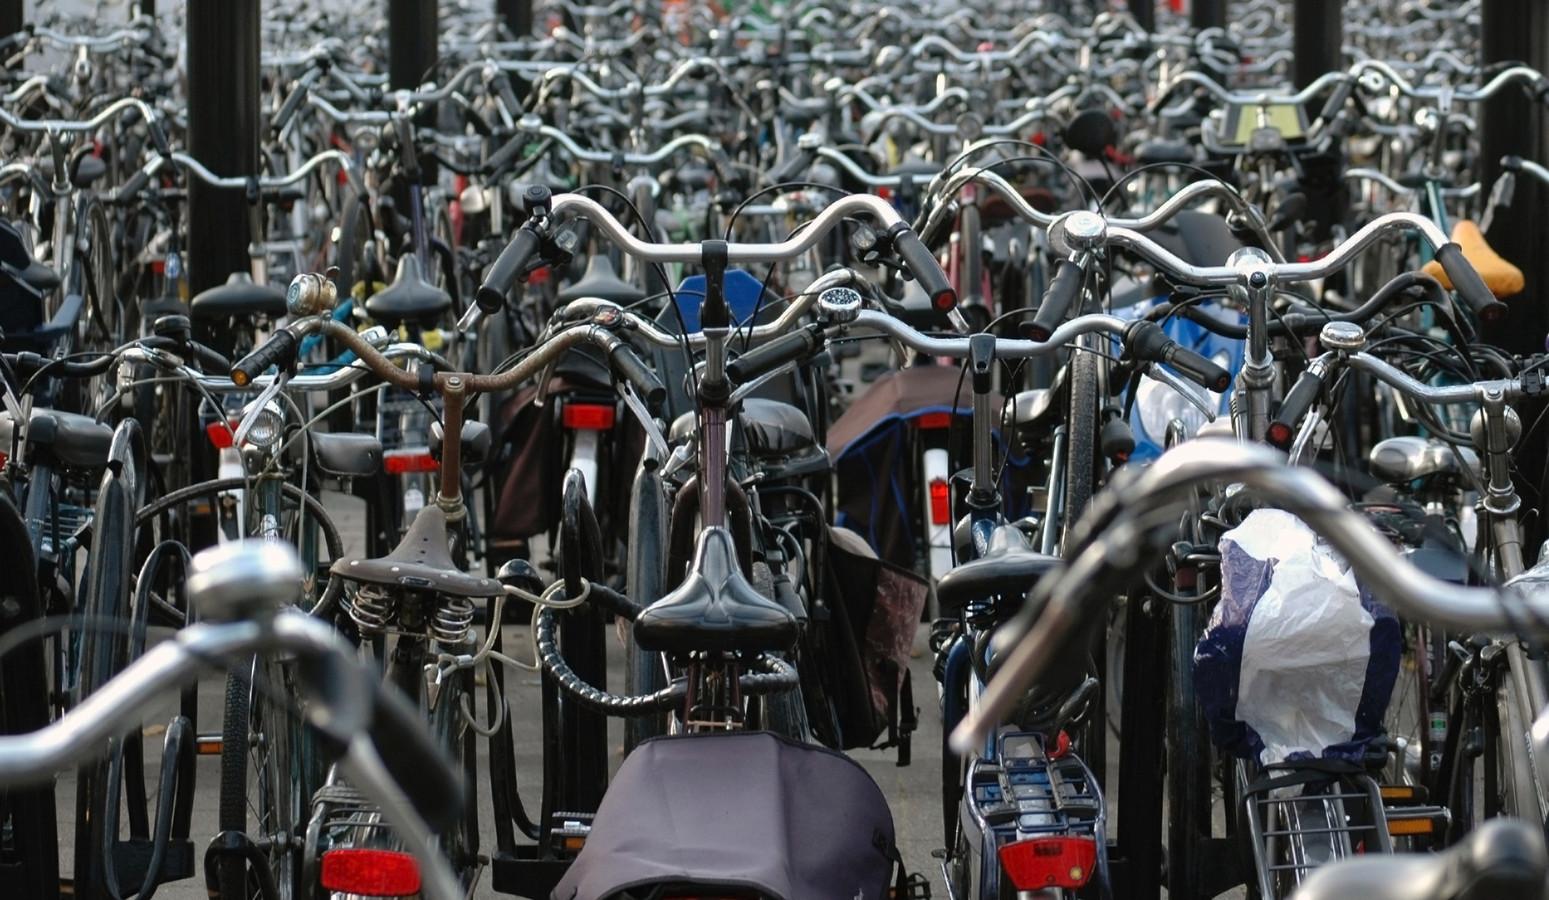 Fietsendief betrapt en aangehouden in Zwolle | Foto | AD.nl: www.ad.nl/zwolle/fietsendief-betrapt-en-aangehouden-in-zwolle...